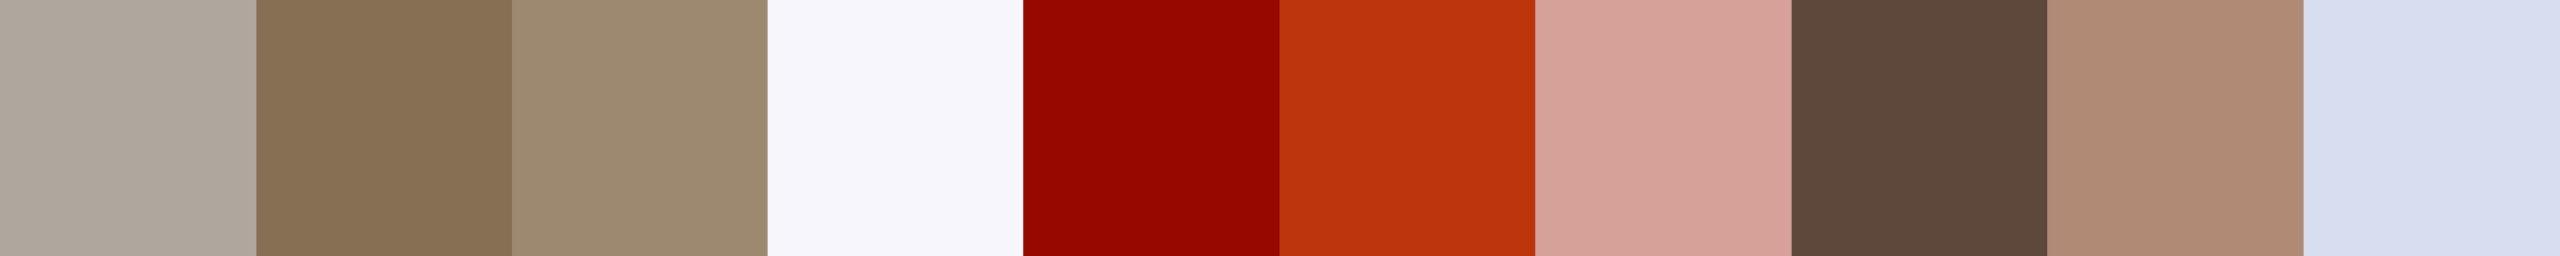 700 Xorvepia Color Palette